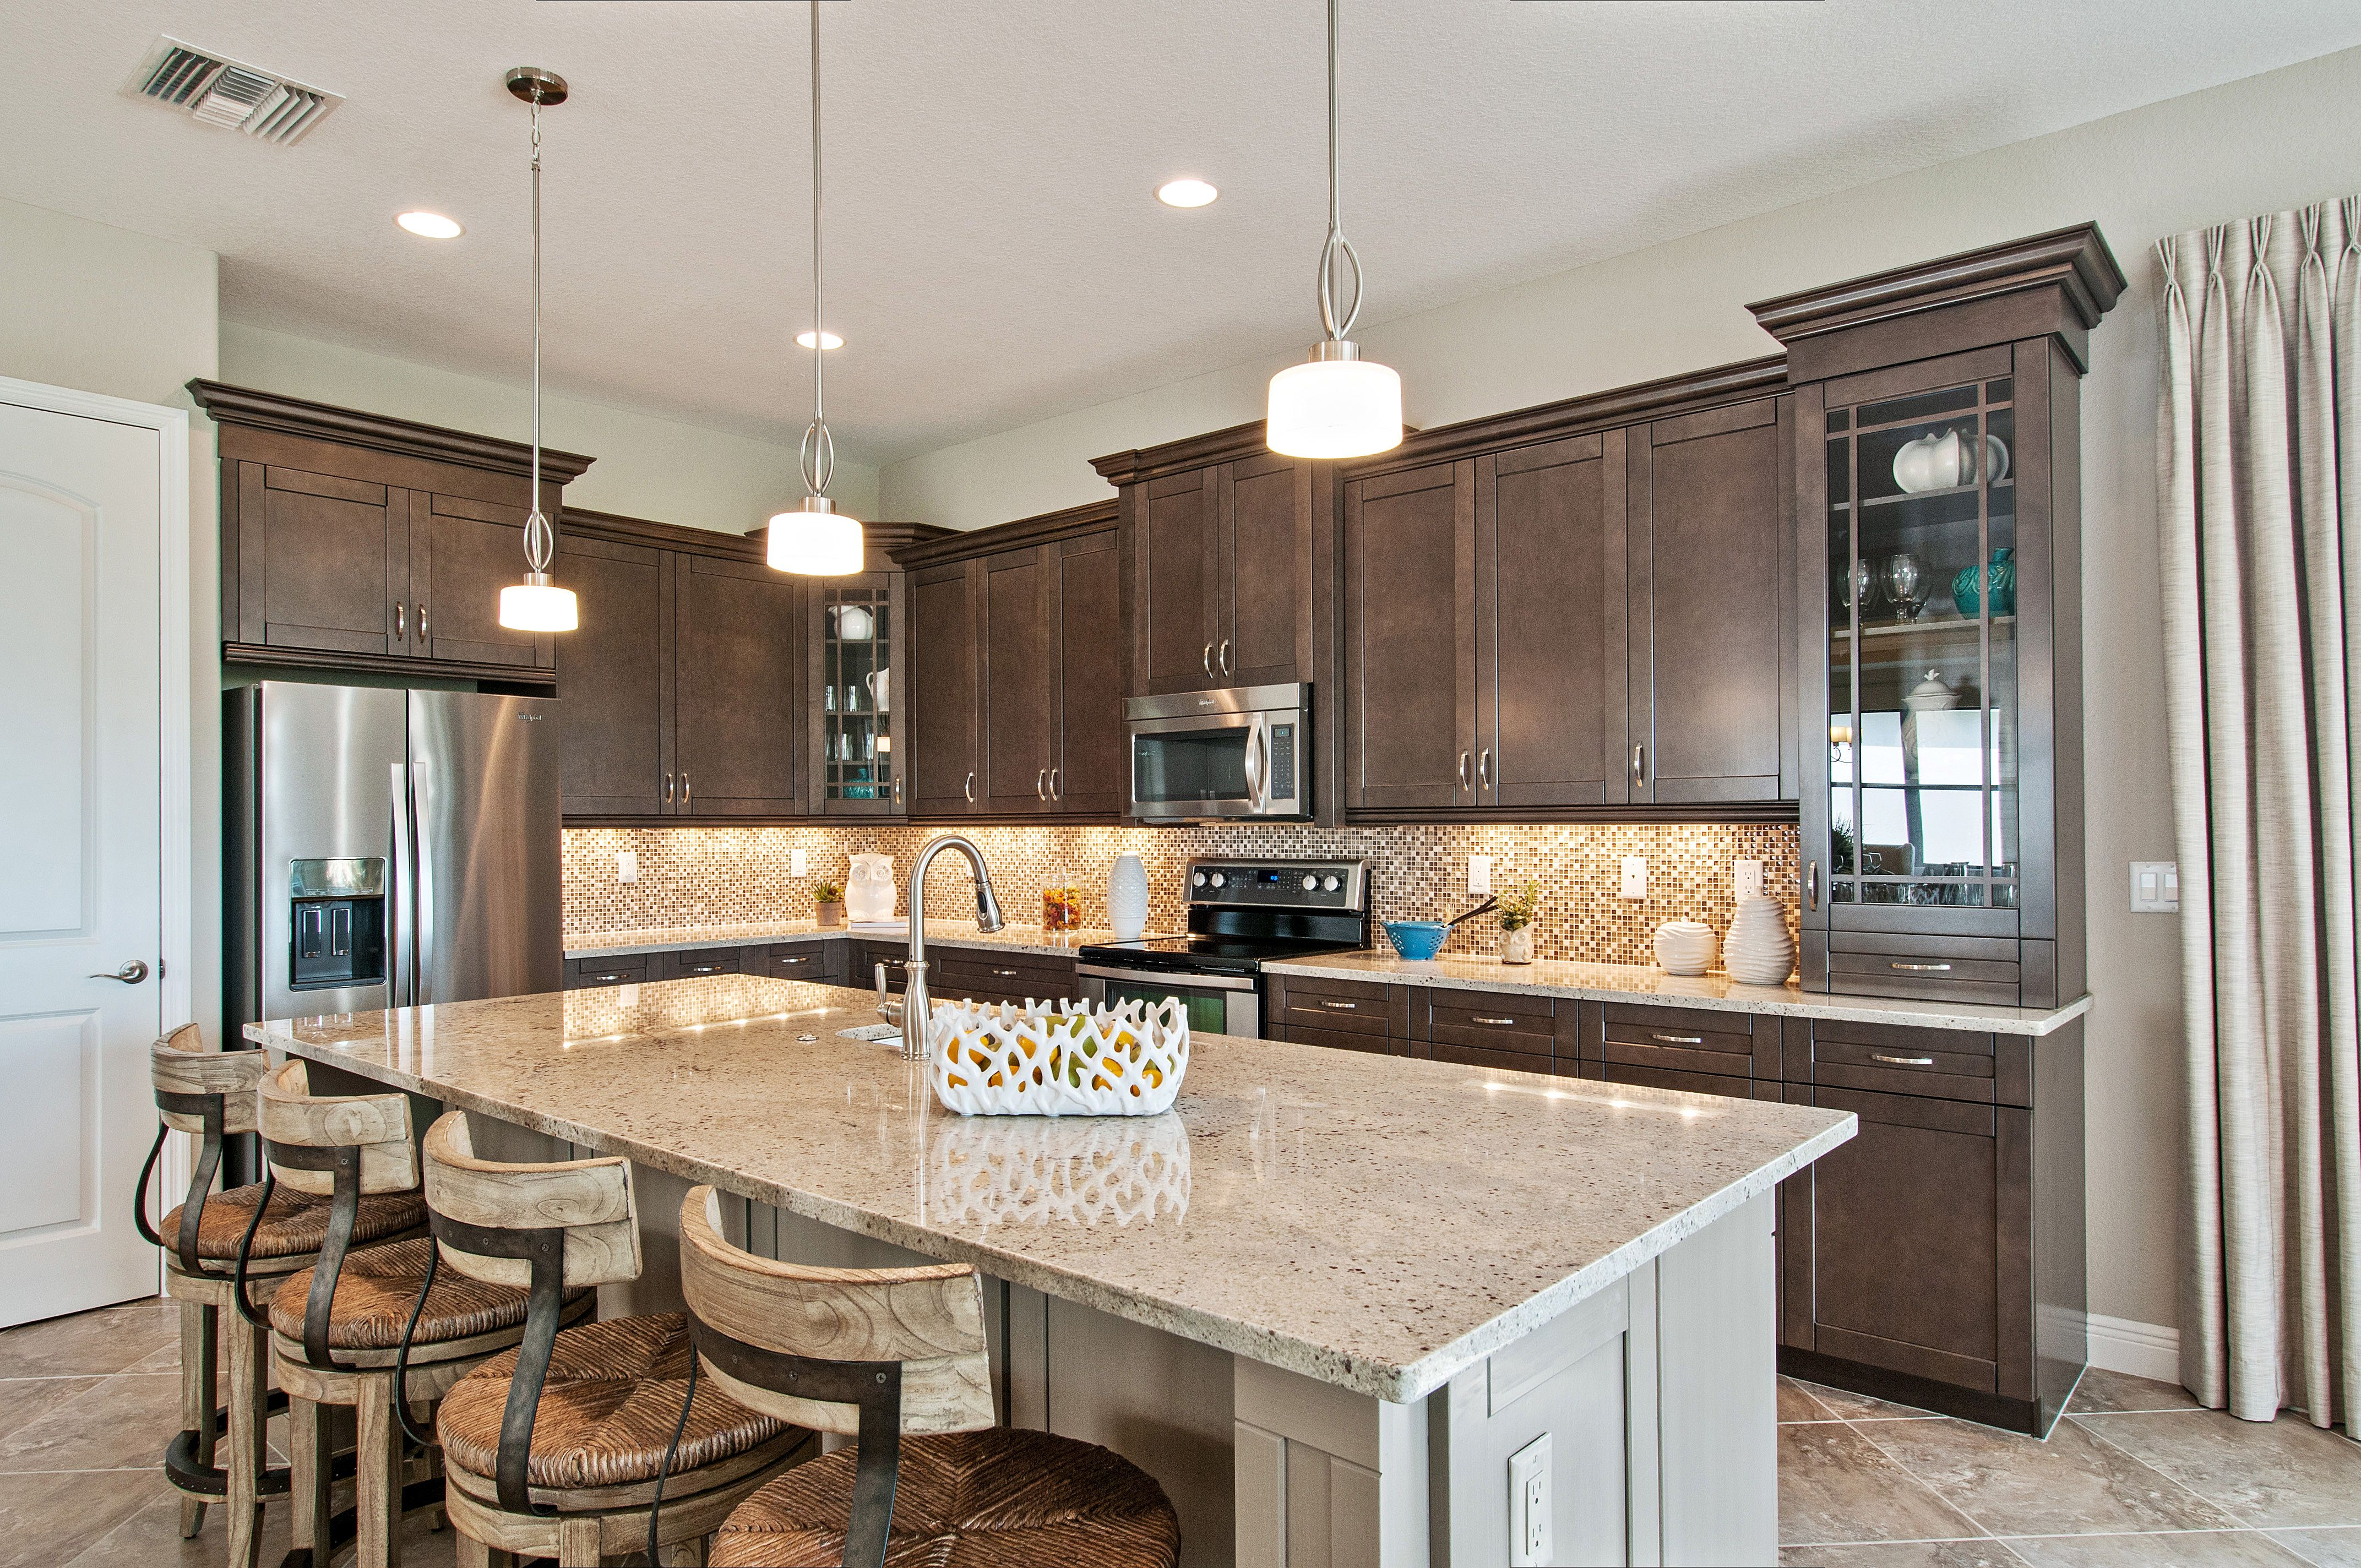 The Cordoba Model Home Kitchen Redesign Luxury Kitchens Kitchen Design